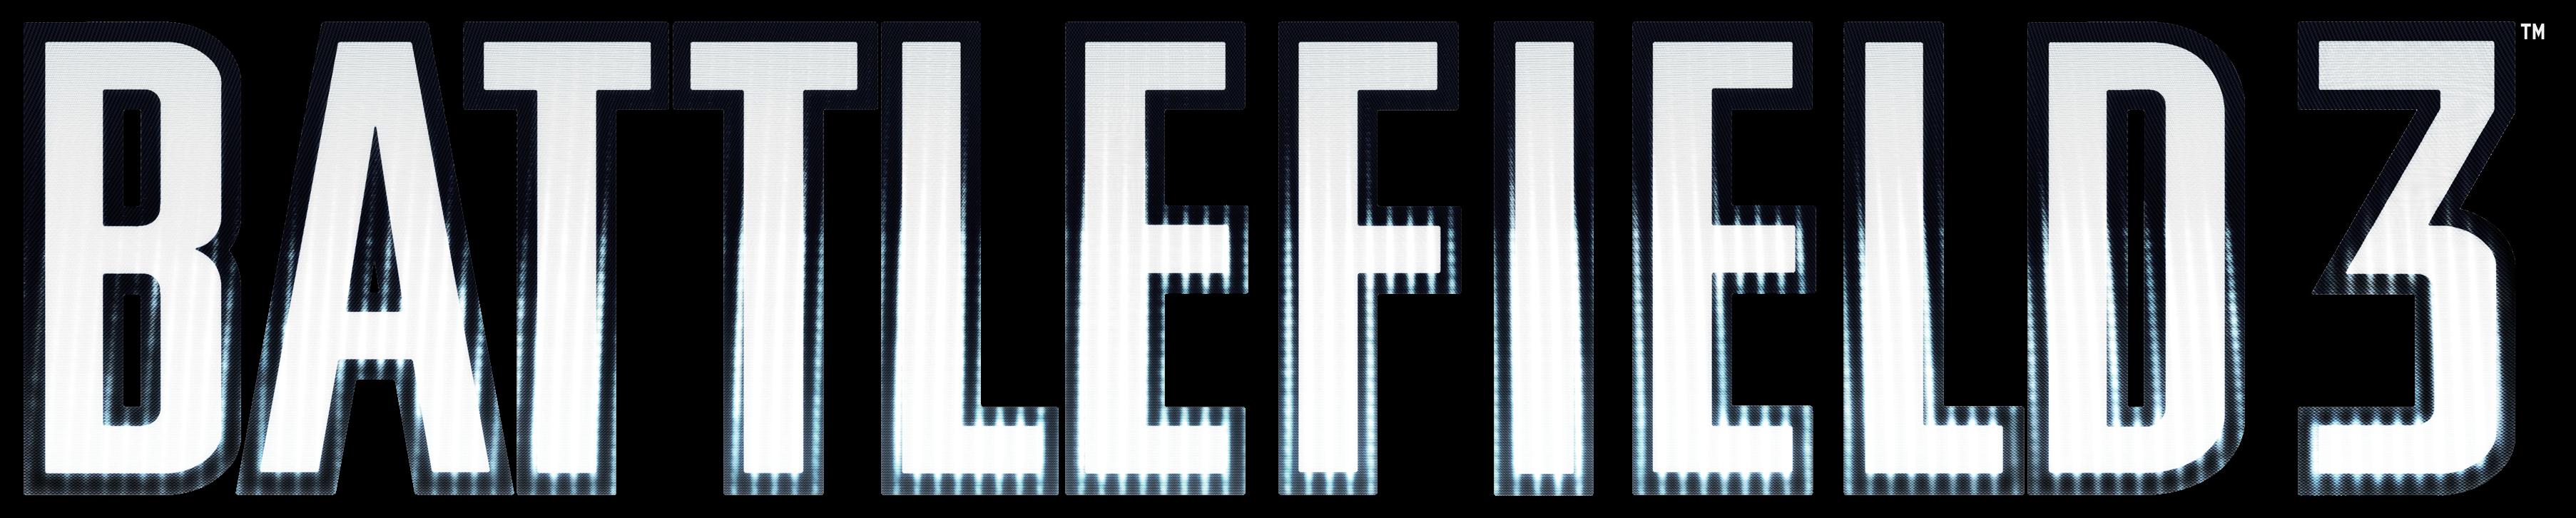 Battlefield 3 логотип PNG